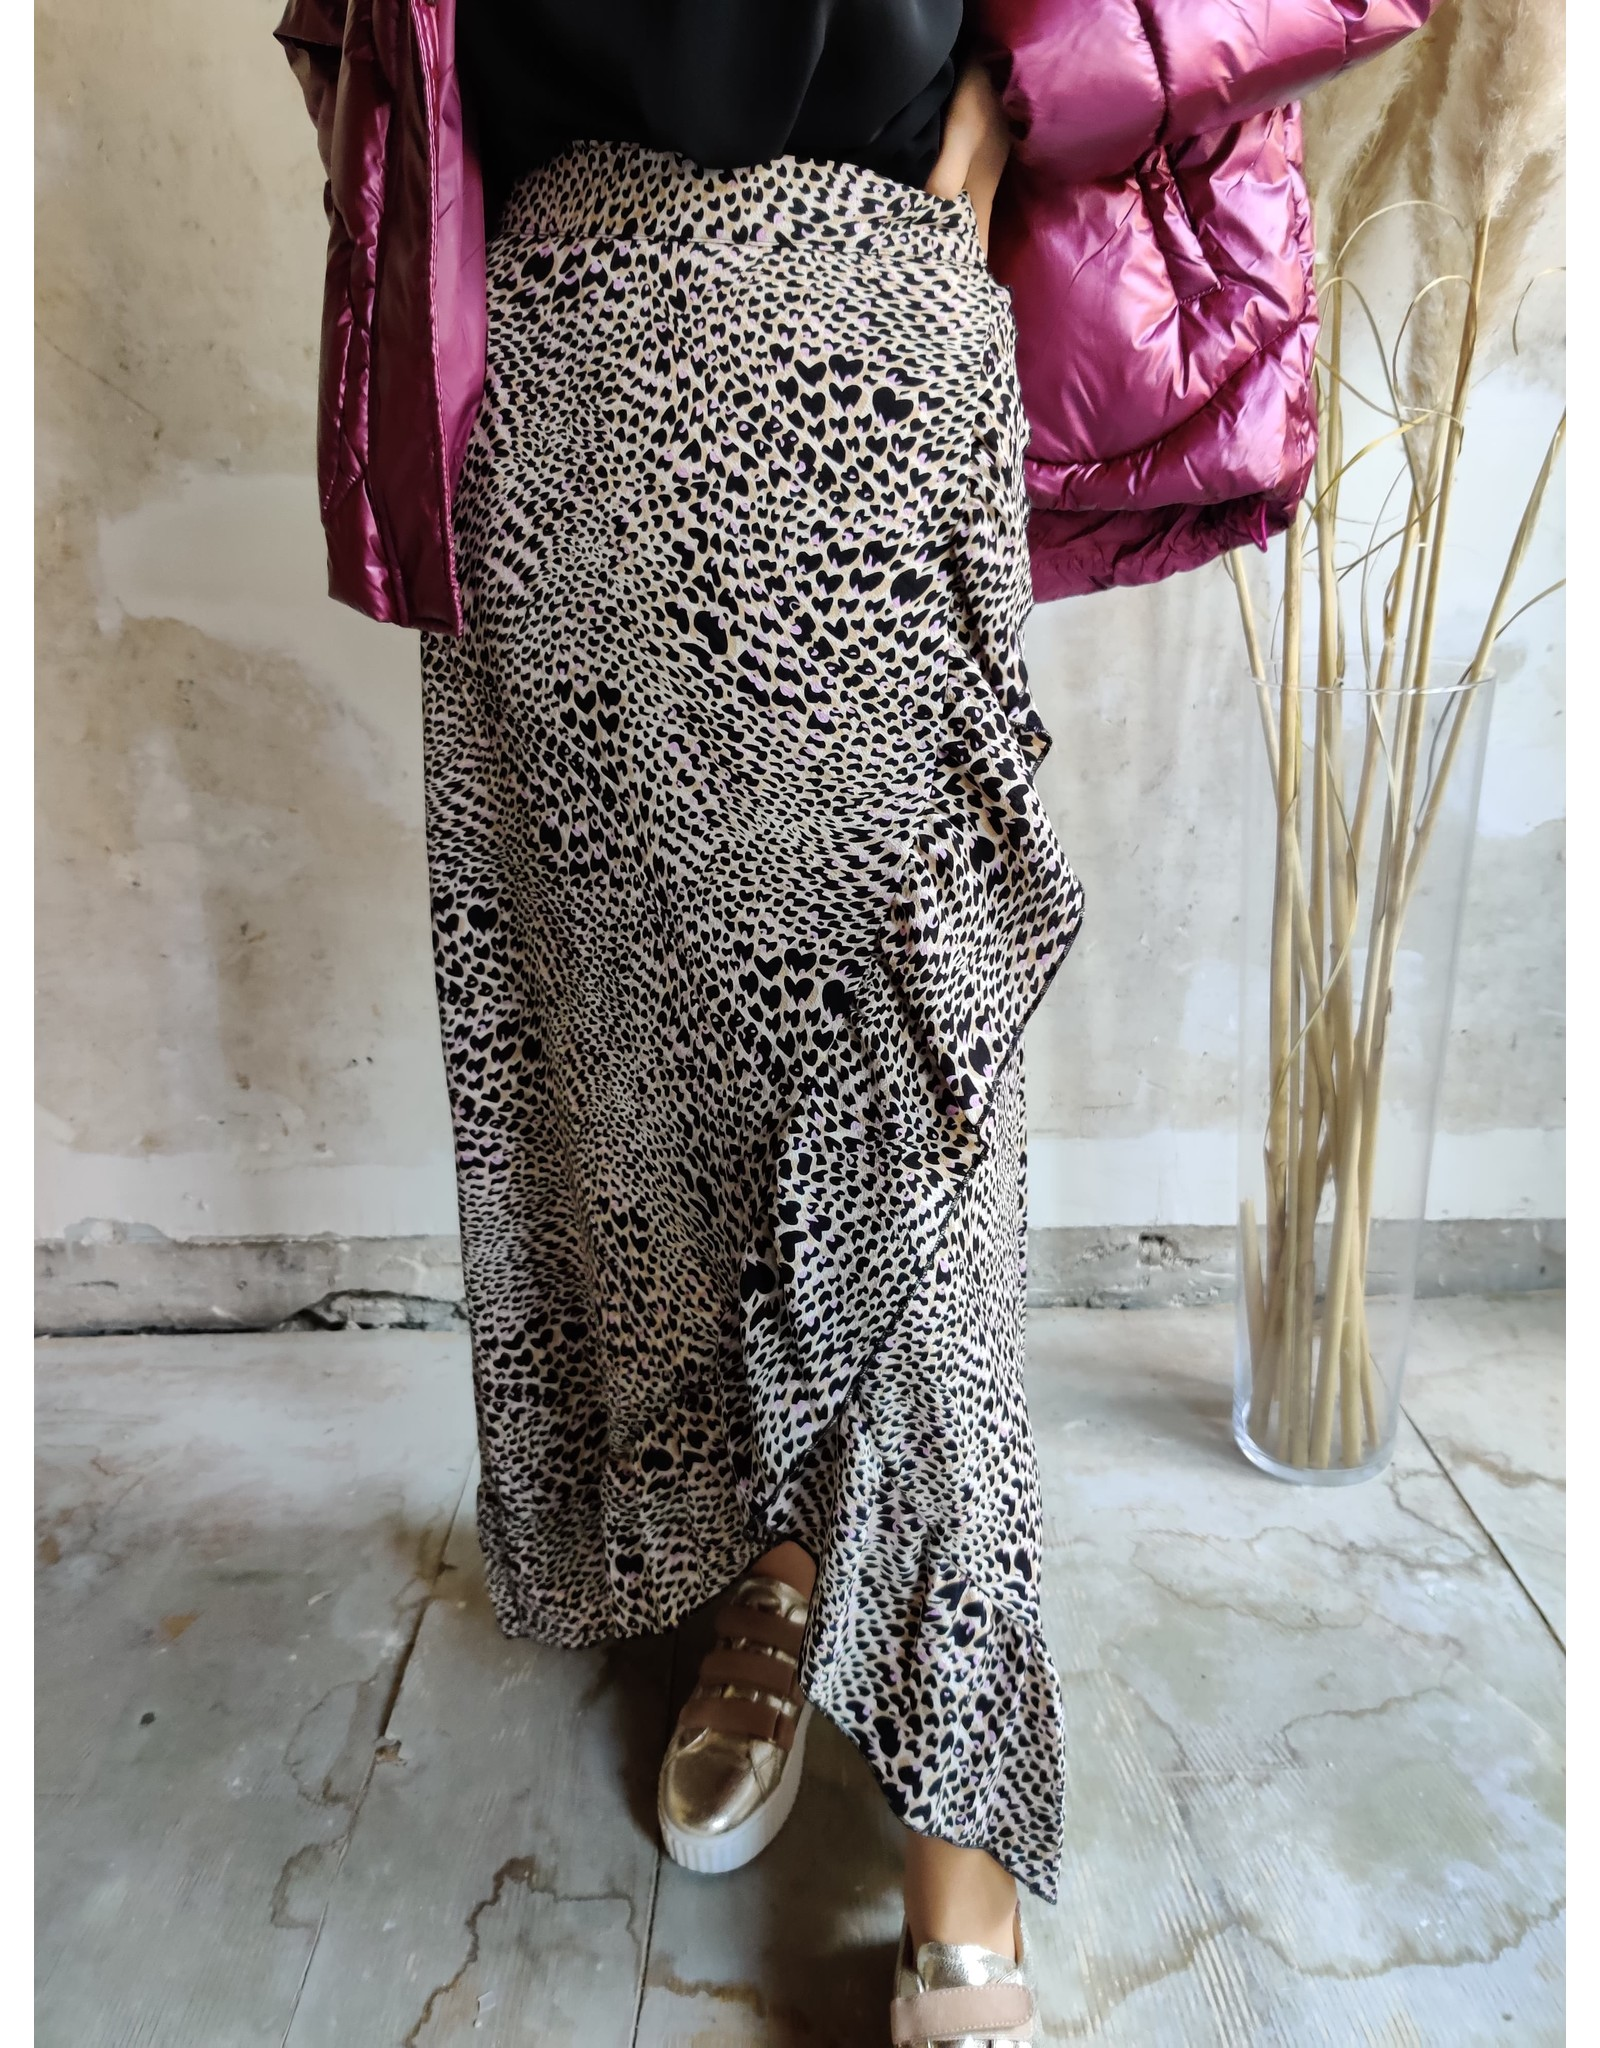 LEOPARD WRAP DRESS BROWN/LILA